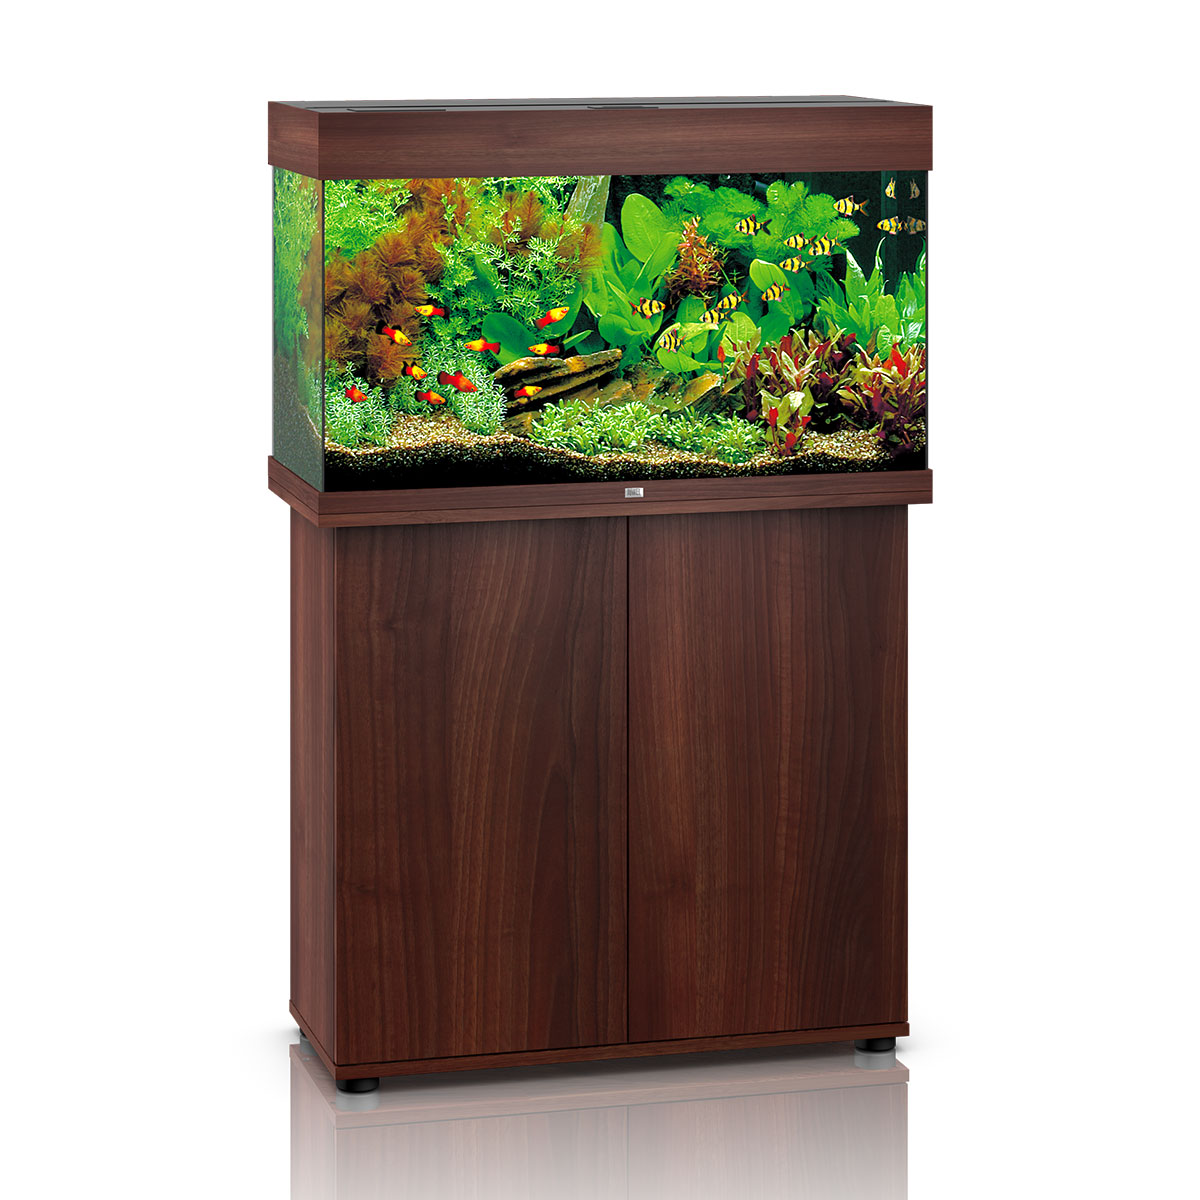 juwel rio 125 led komplett aquarium mit unterschrank sbx. Black Bedroom Furniture Sets. Home Design Ideas